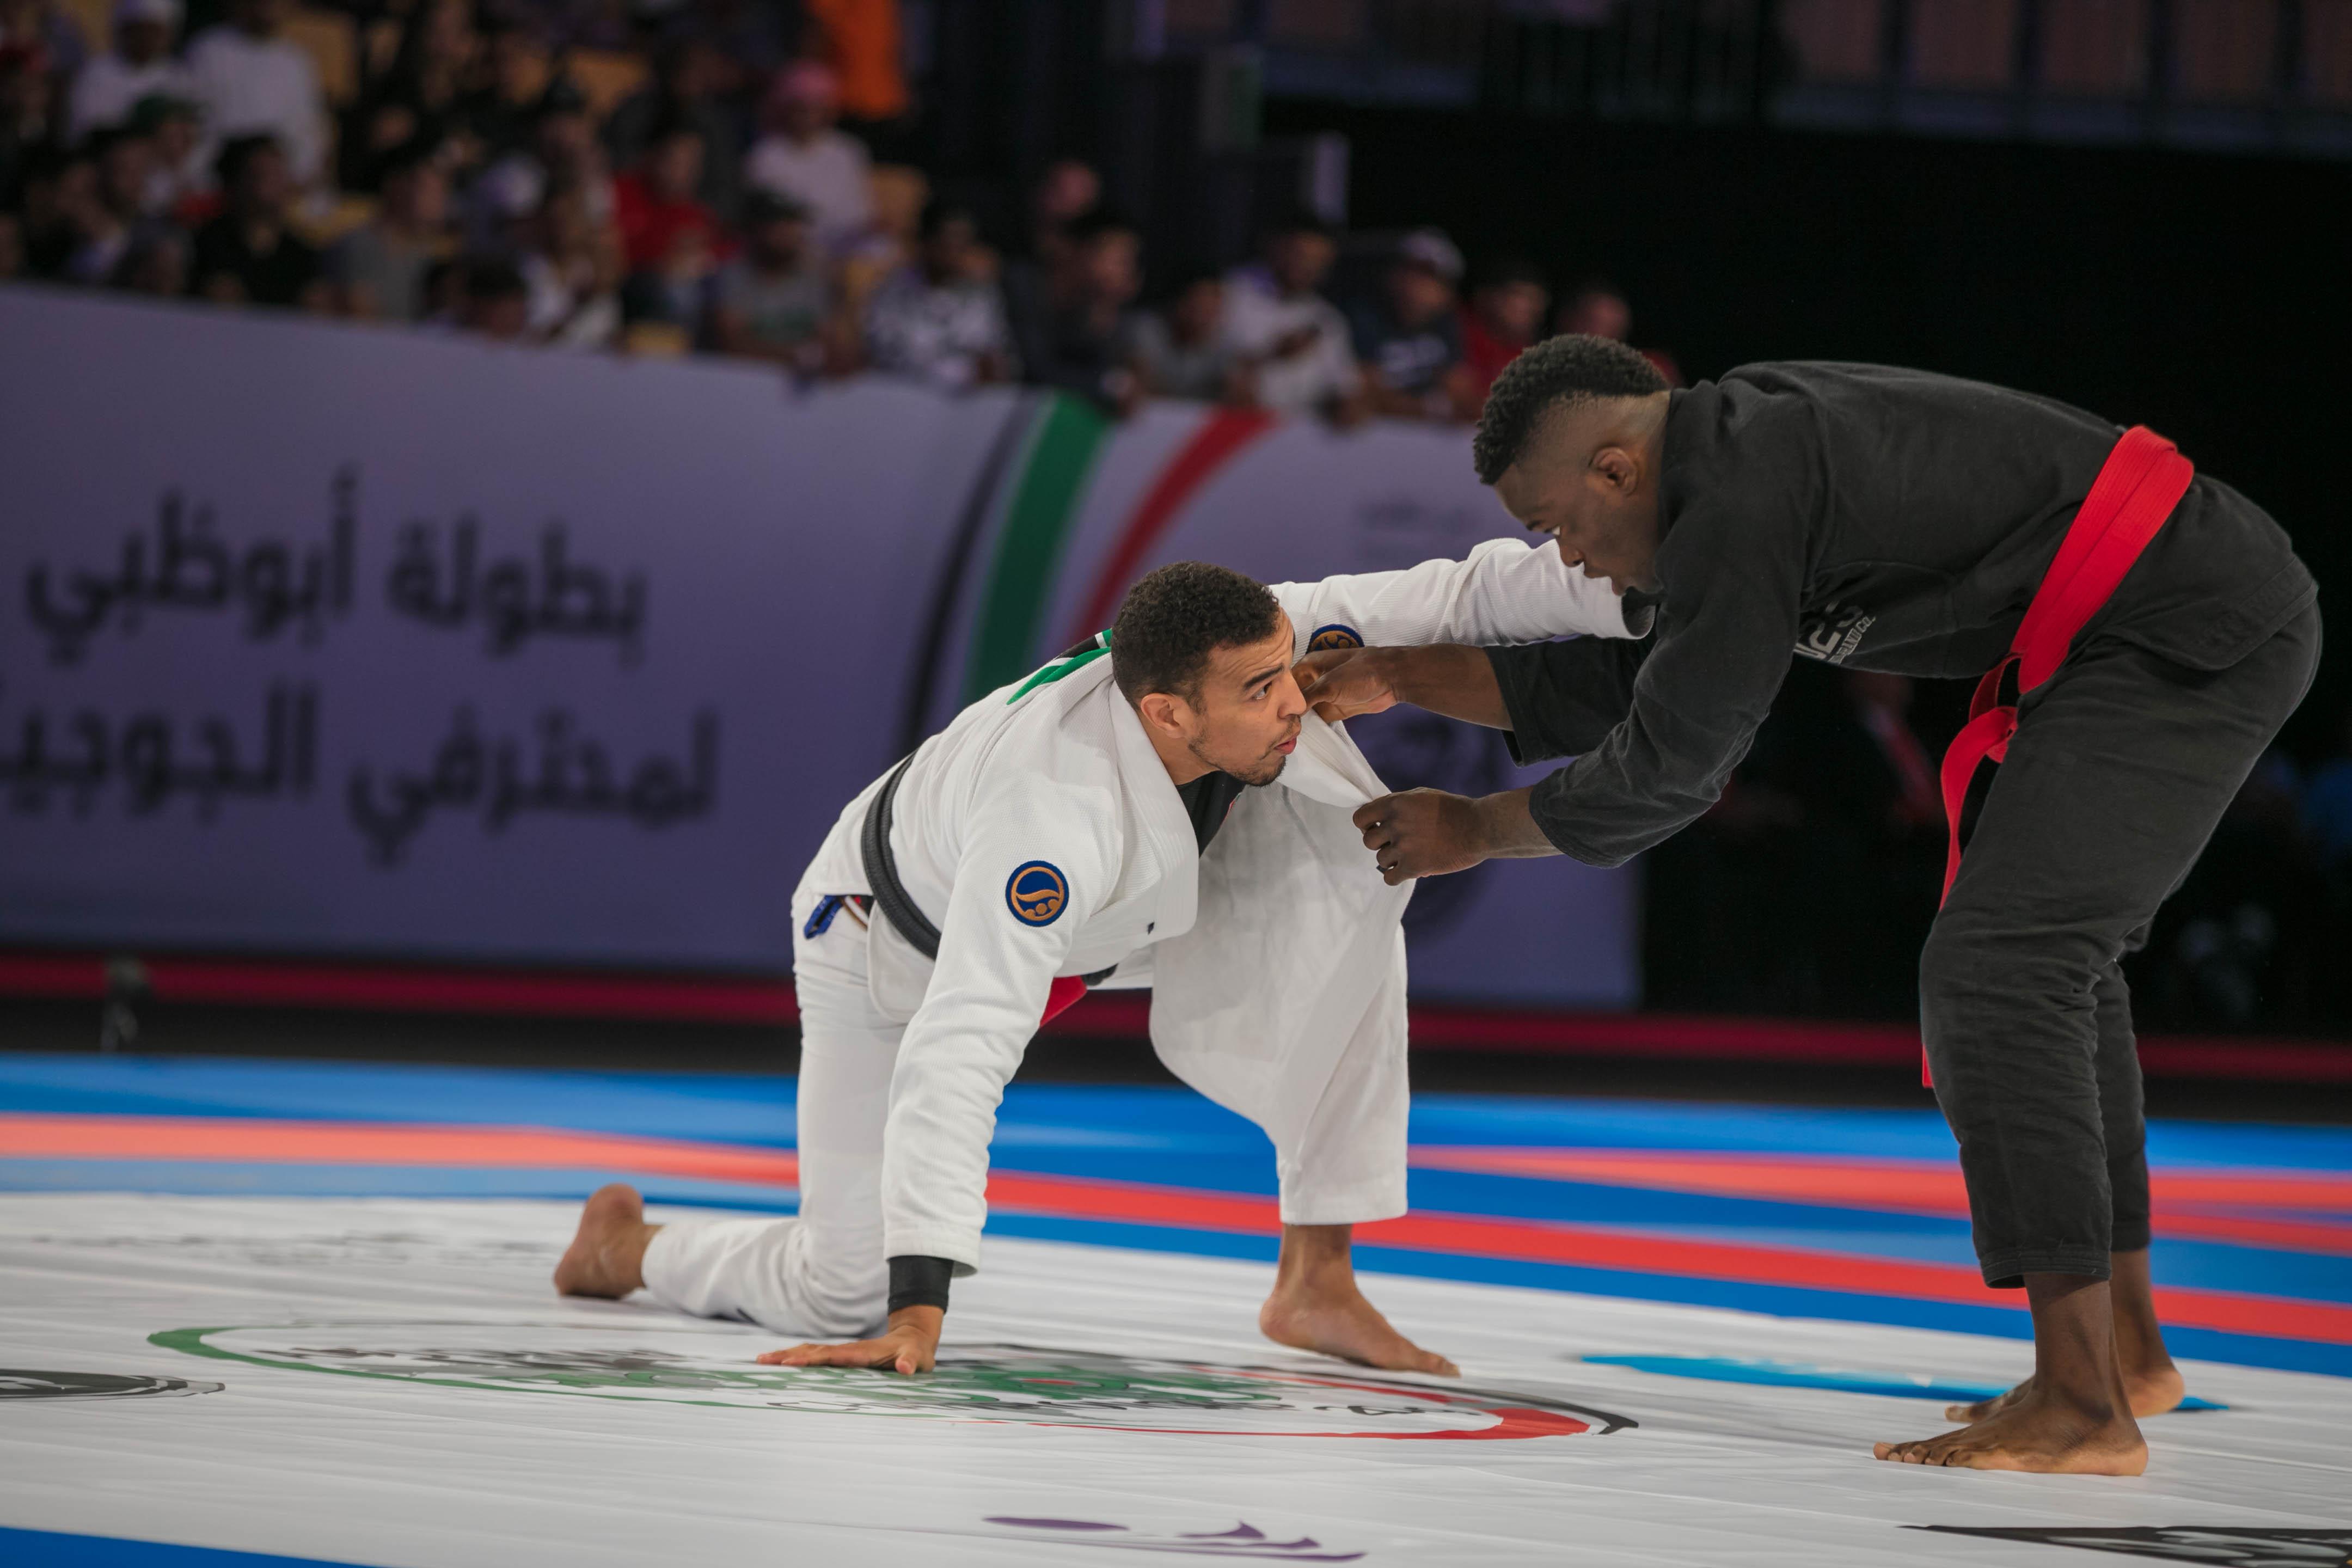 global athletes to partake in abu dhabi world professional jiu-jitsu championship in april 3